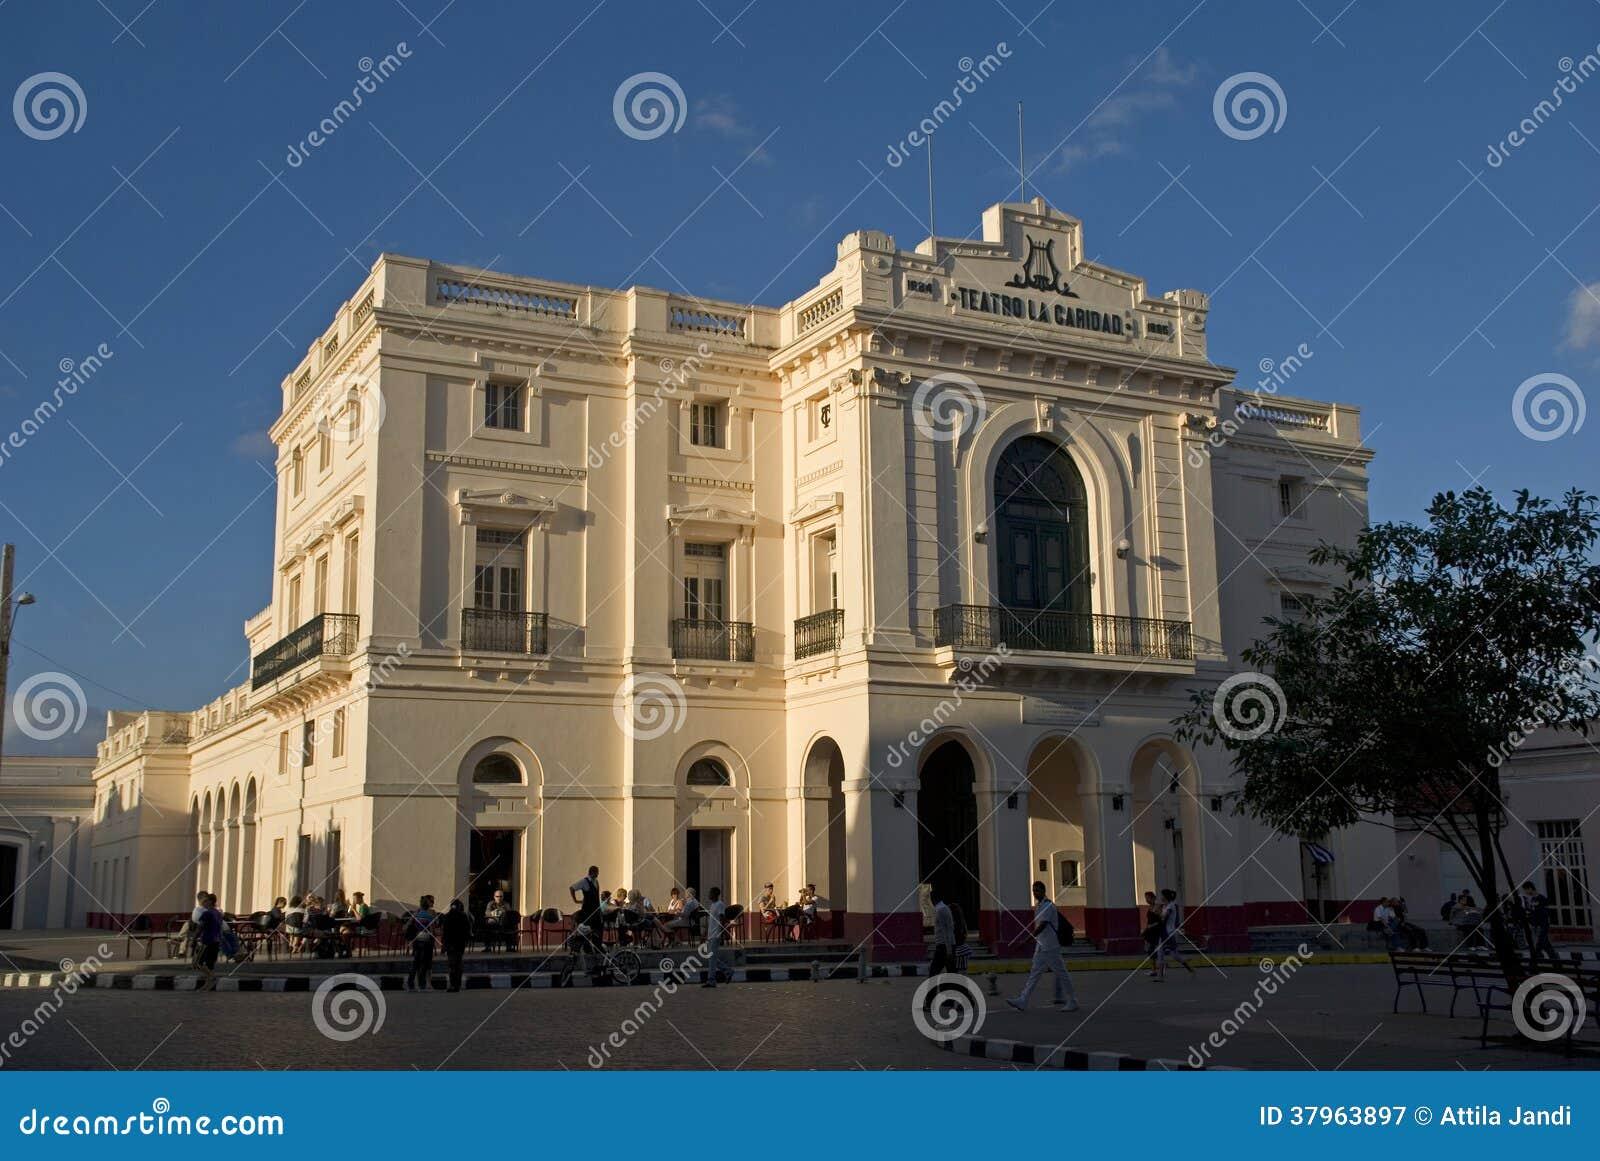 Caridad Theatre, Santa Clara, Cuba